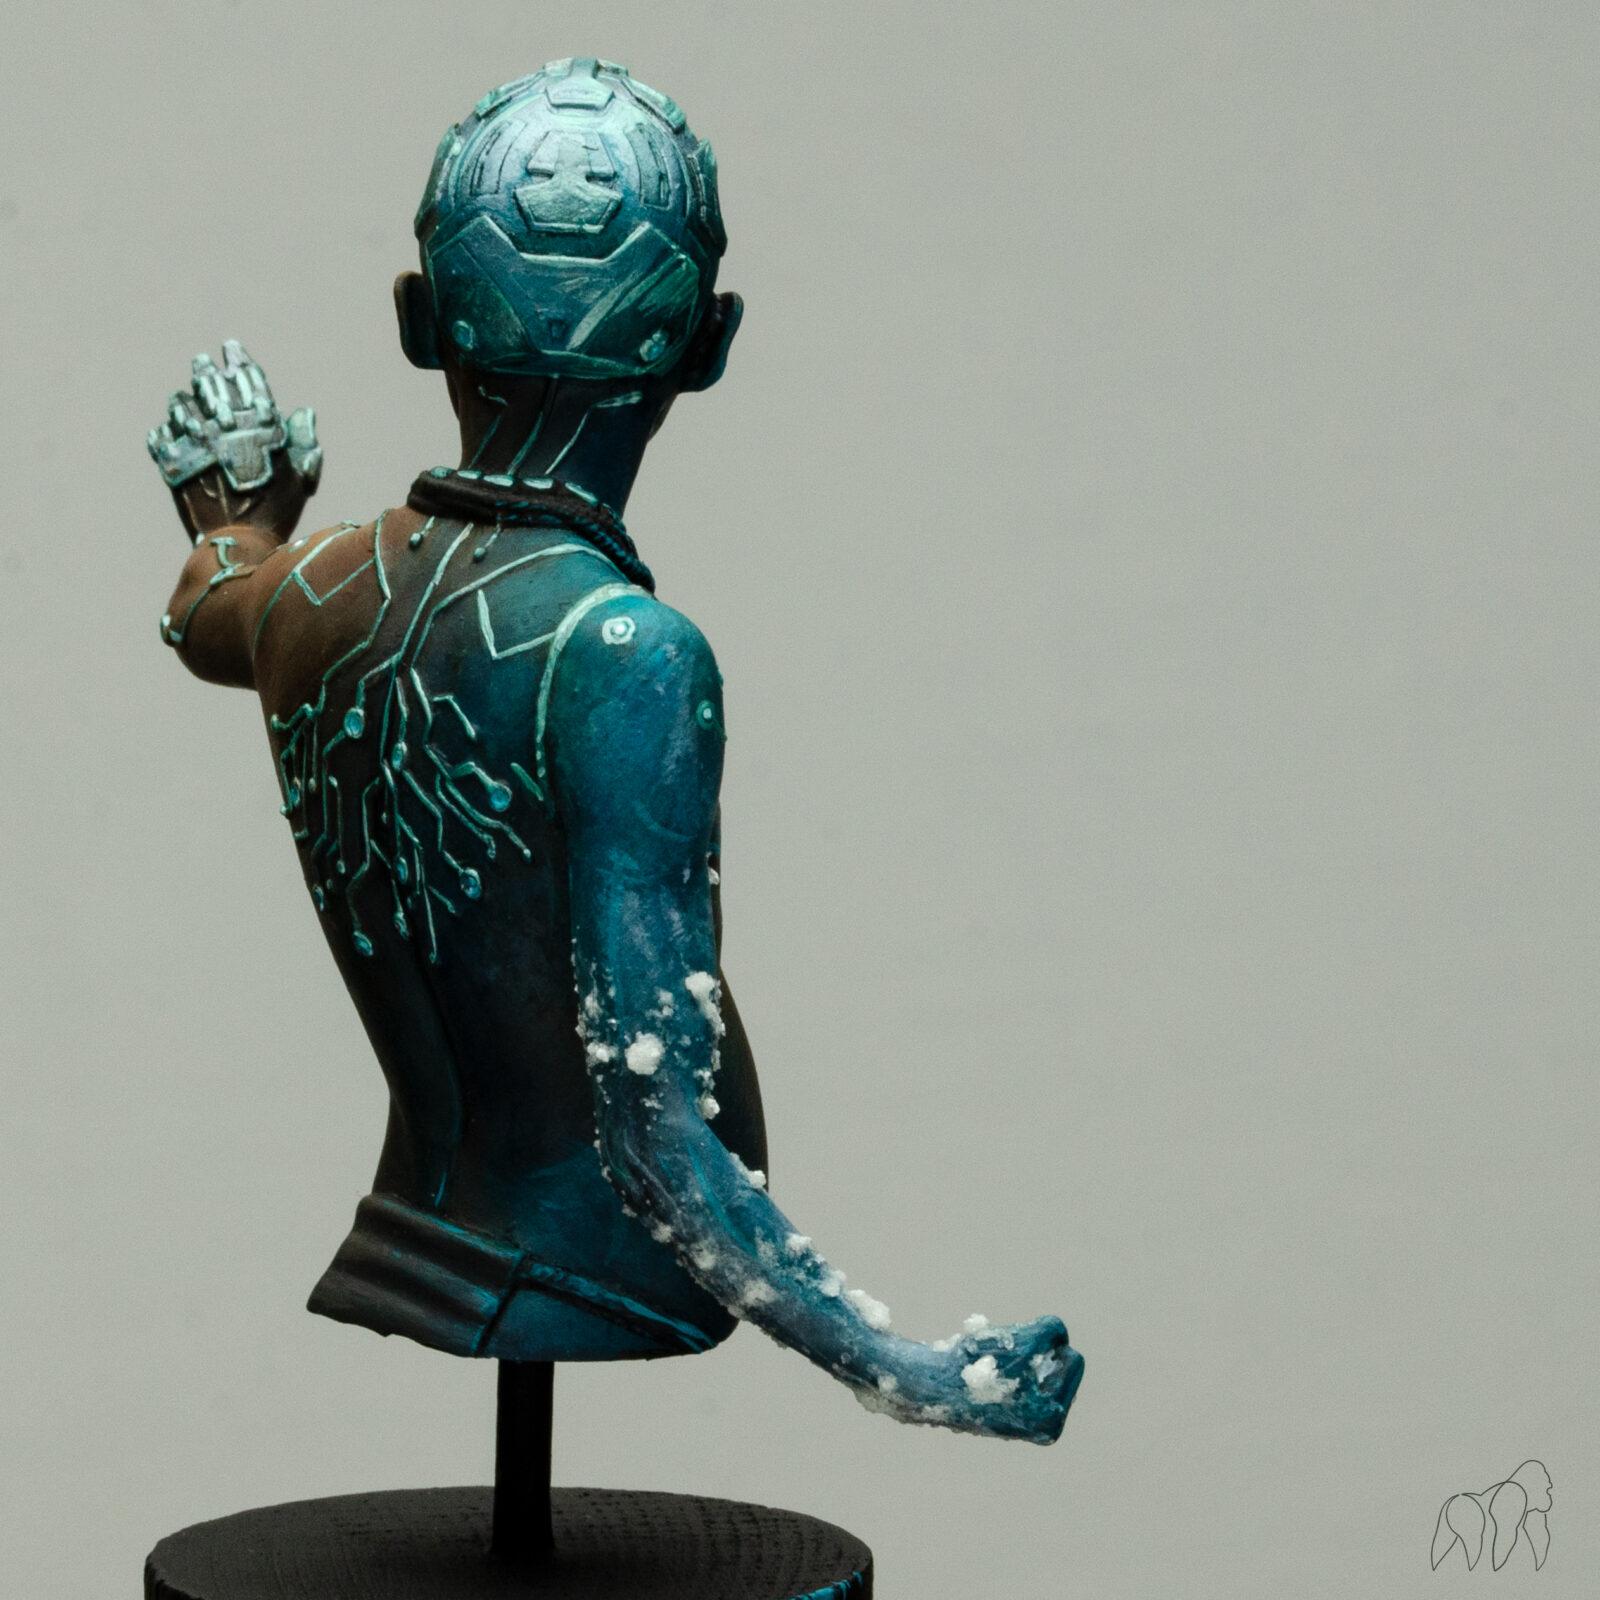 Iceboy11